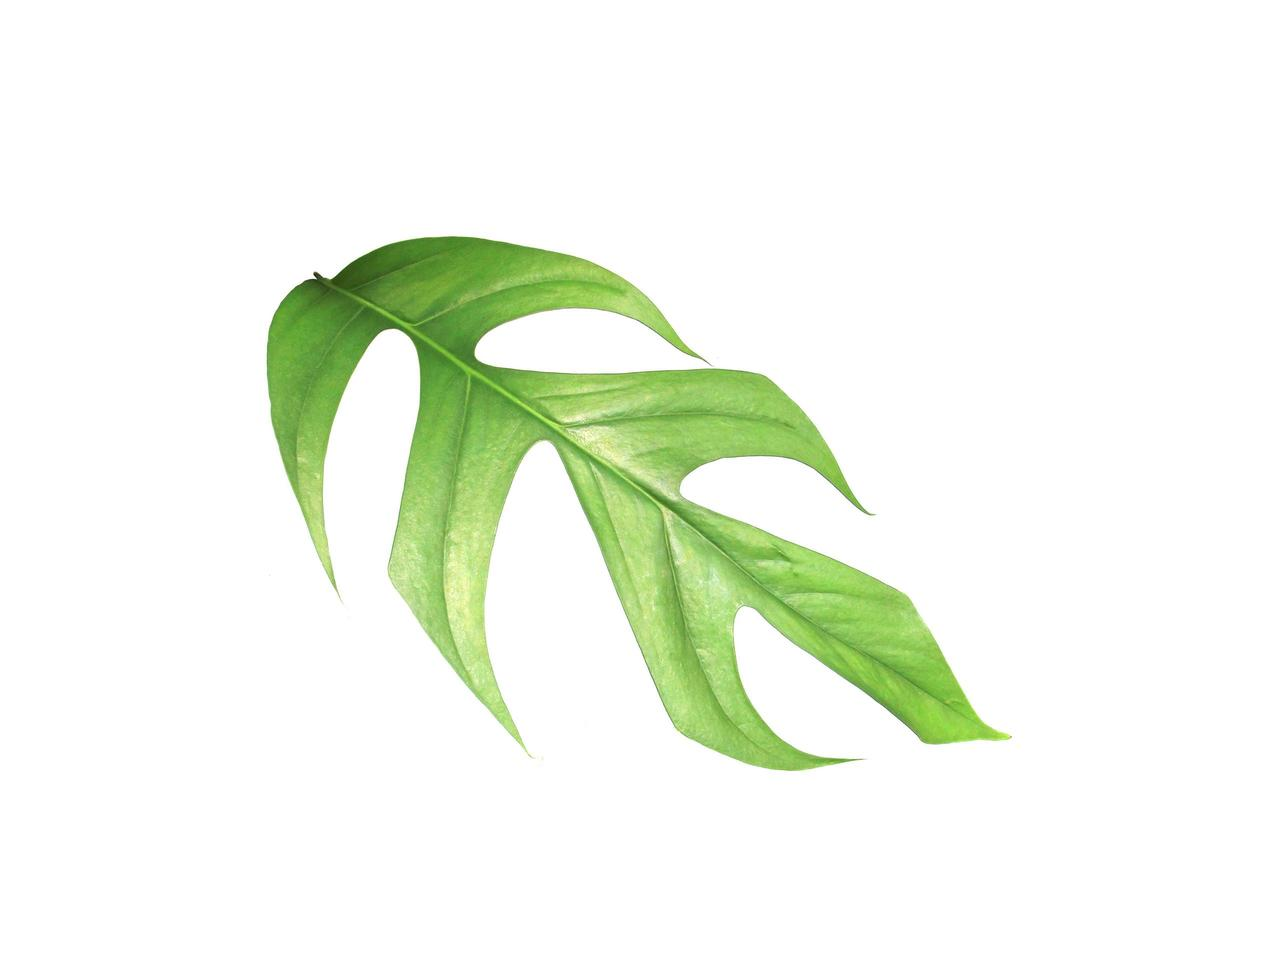 feuille de monstera vert photo